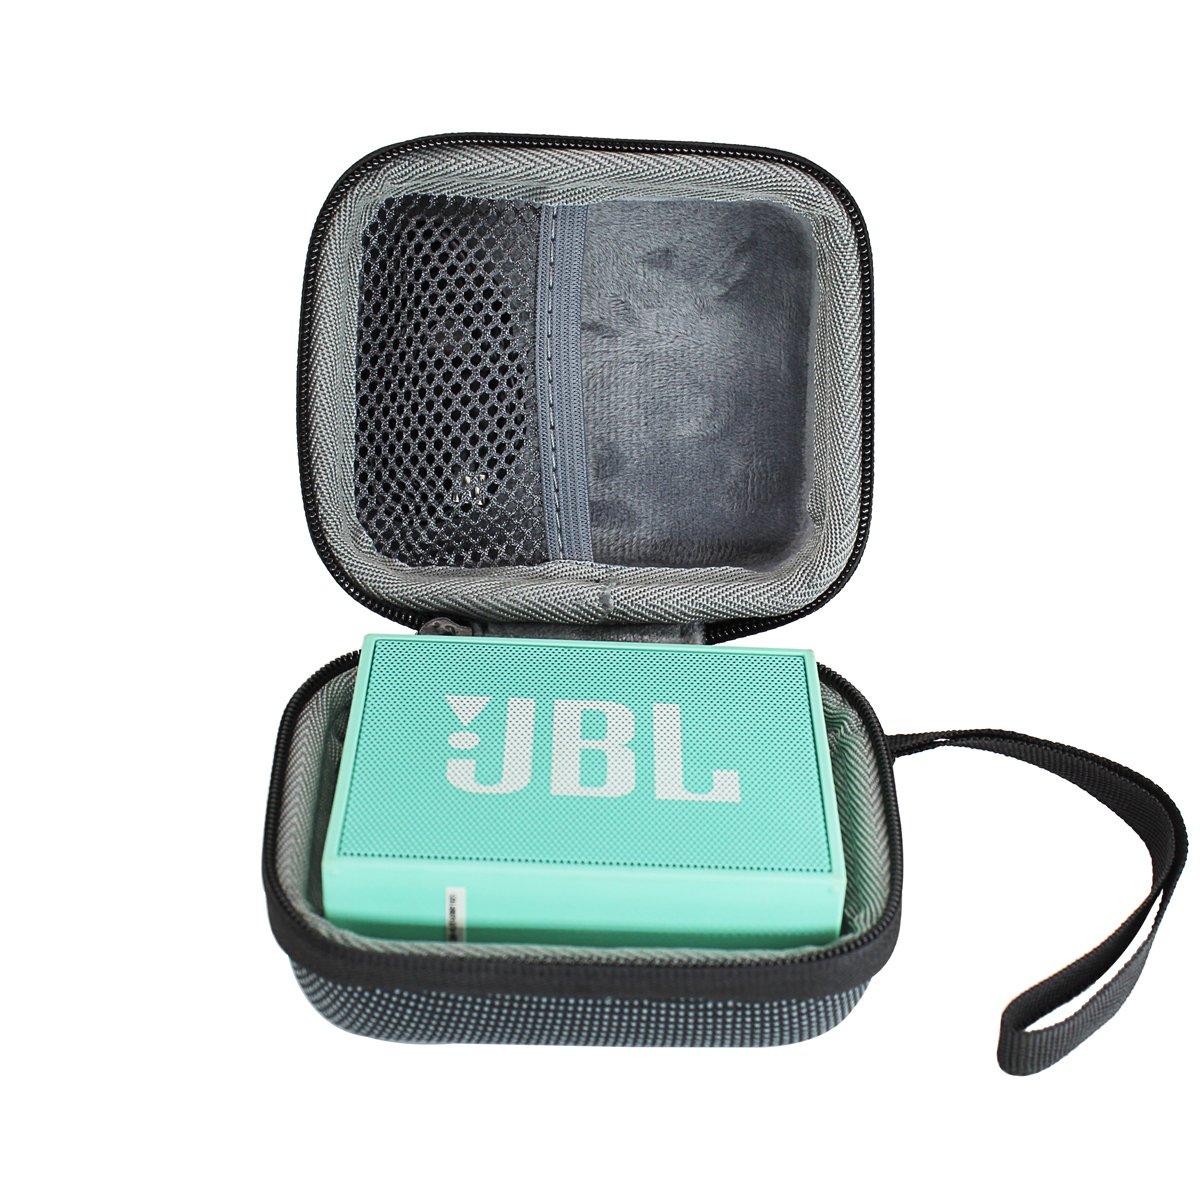 Hard Travel Case Bag for JBL Go Ultra Portable Rechargeable Bluetooth Speaker by VIVENS